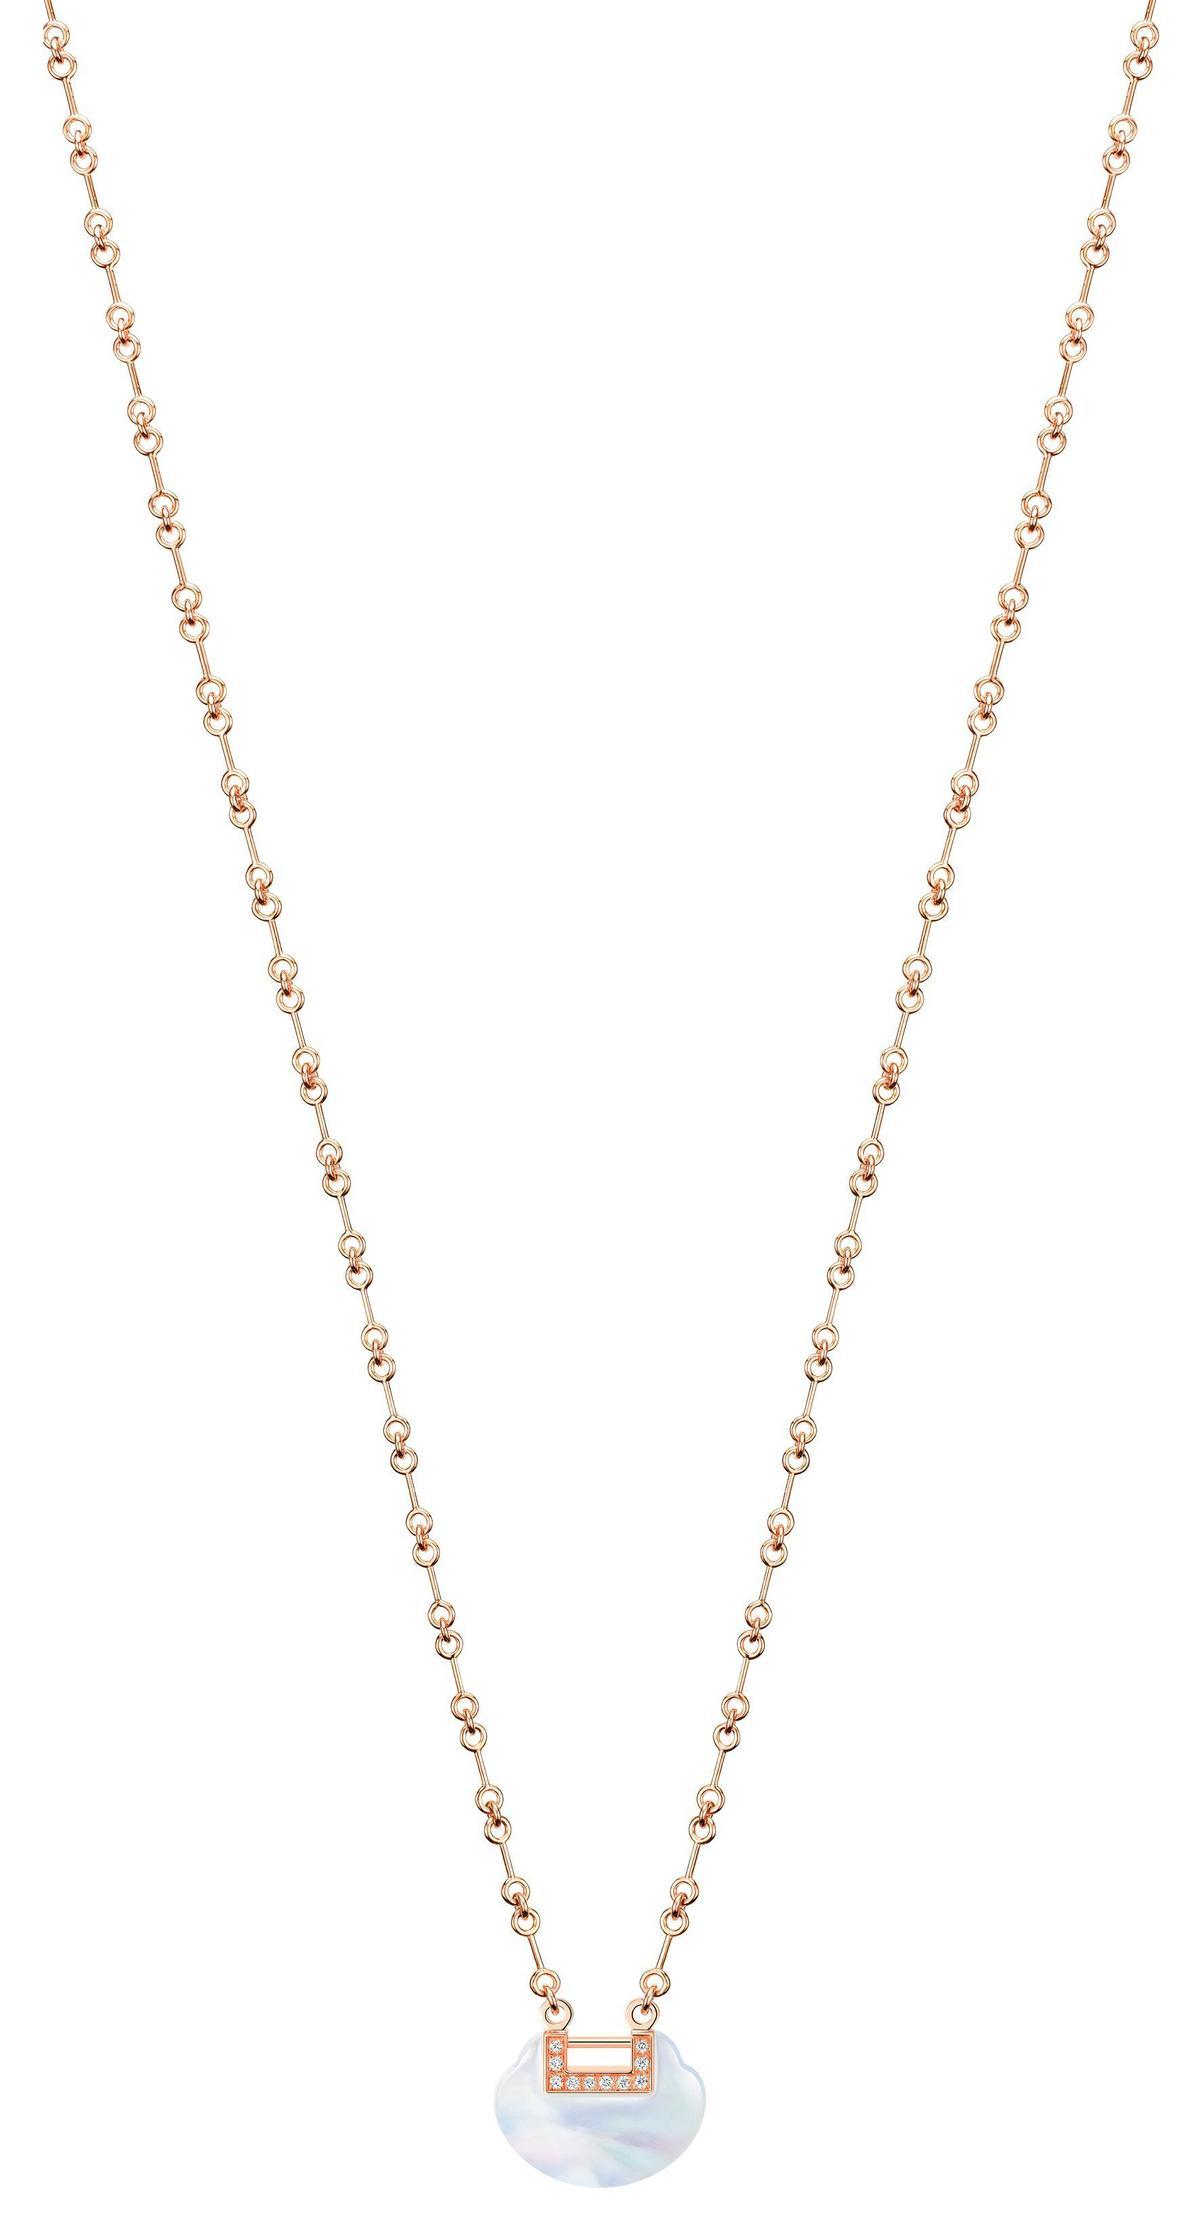 Yu Yi 18K玫瑰金鑲鑽珍珠母貝小型項鍊。NT$118,000(Qeelin提供)